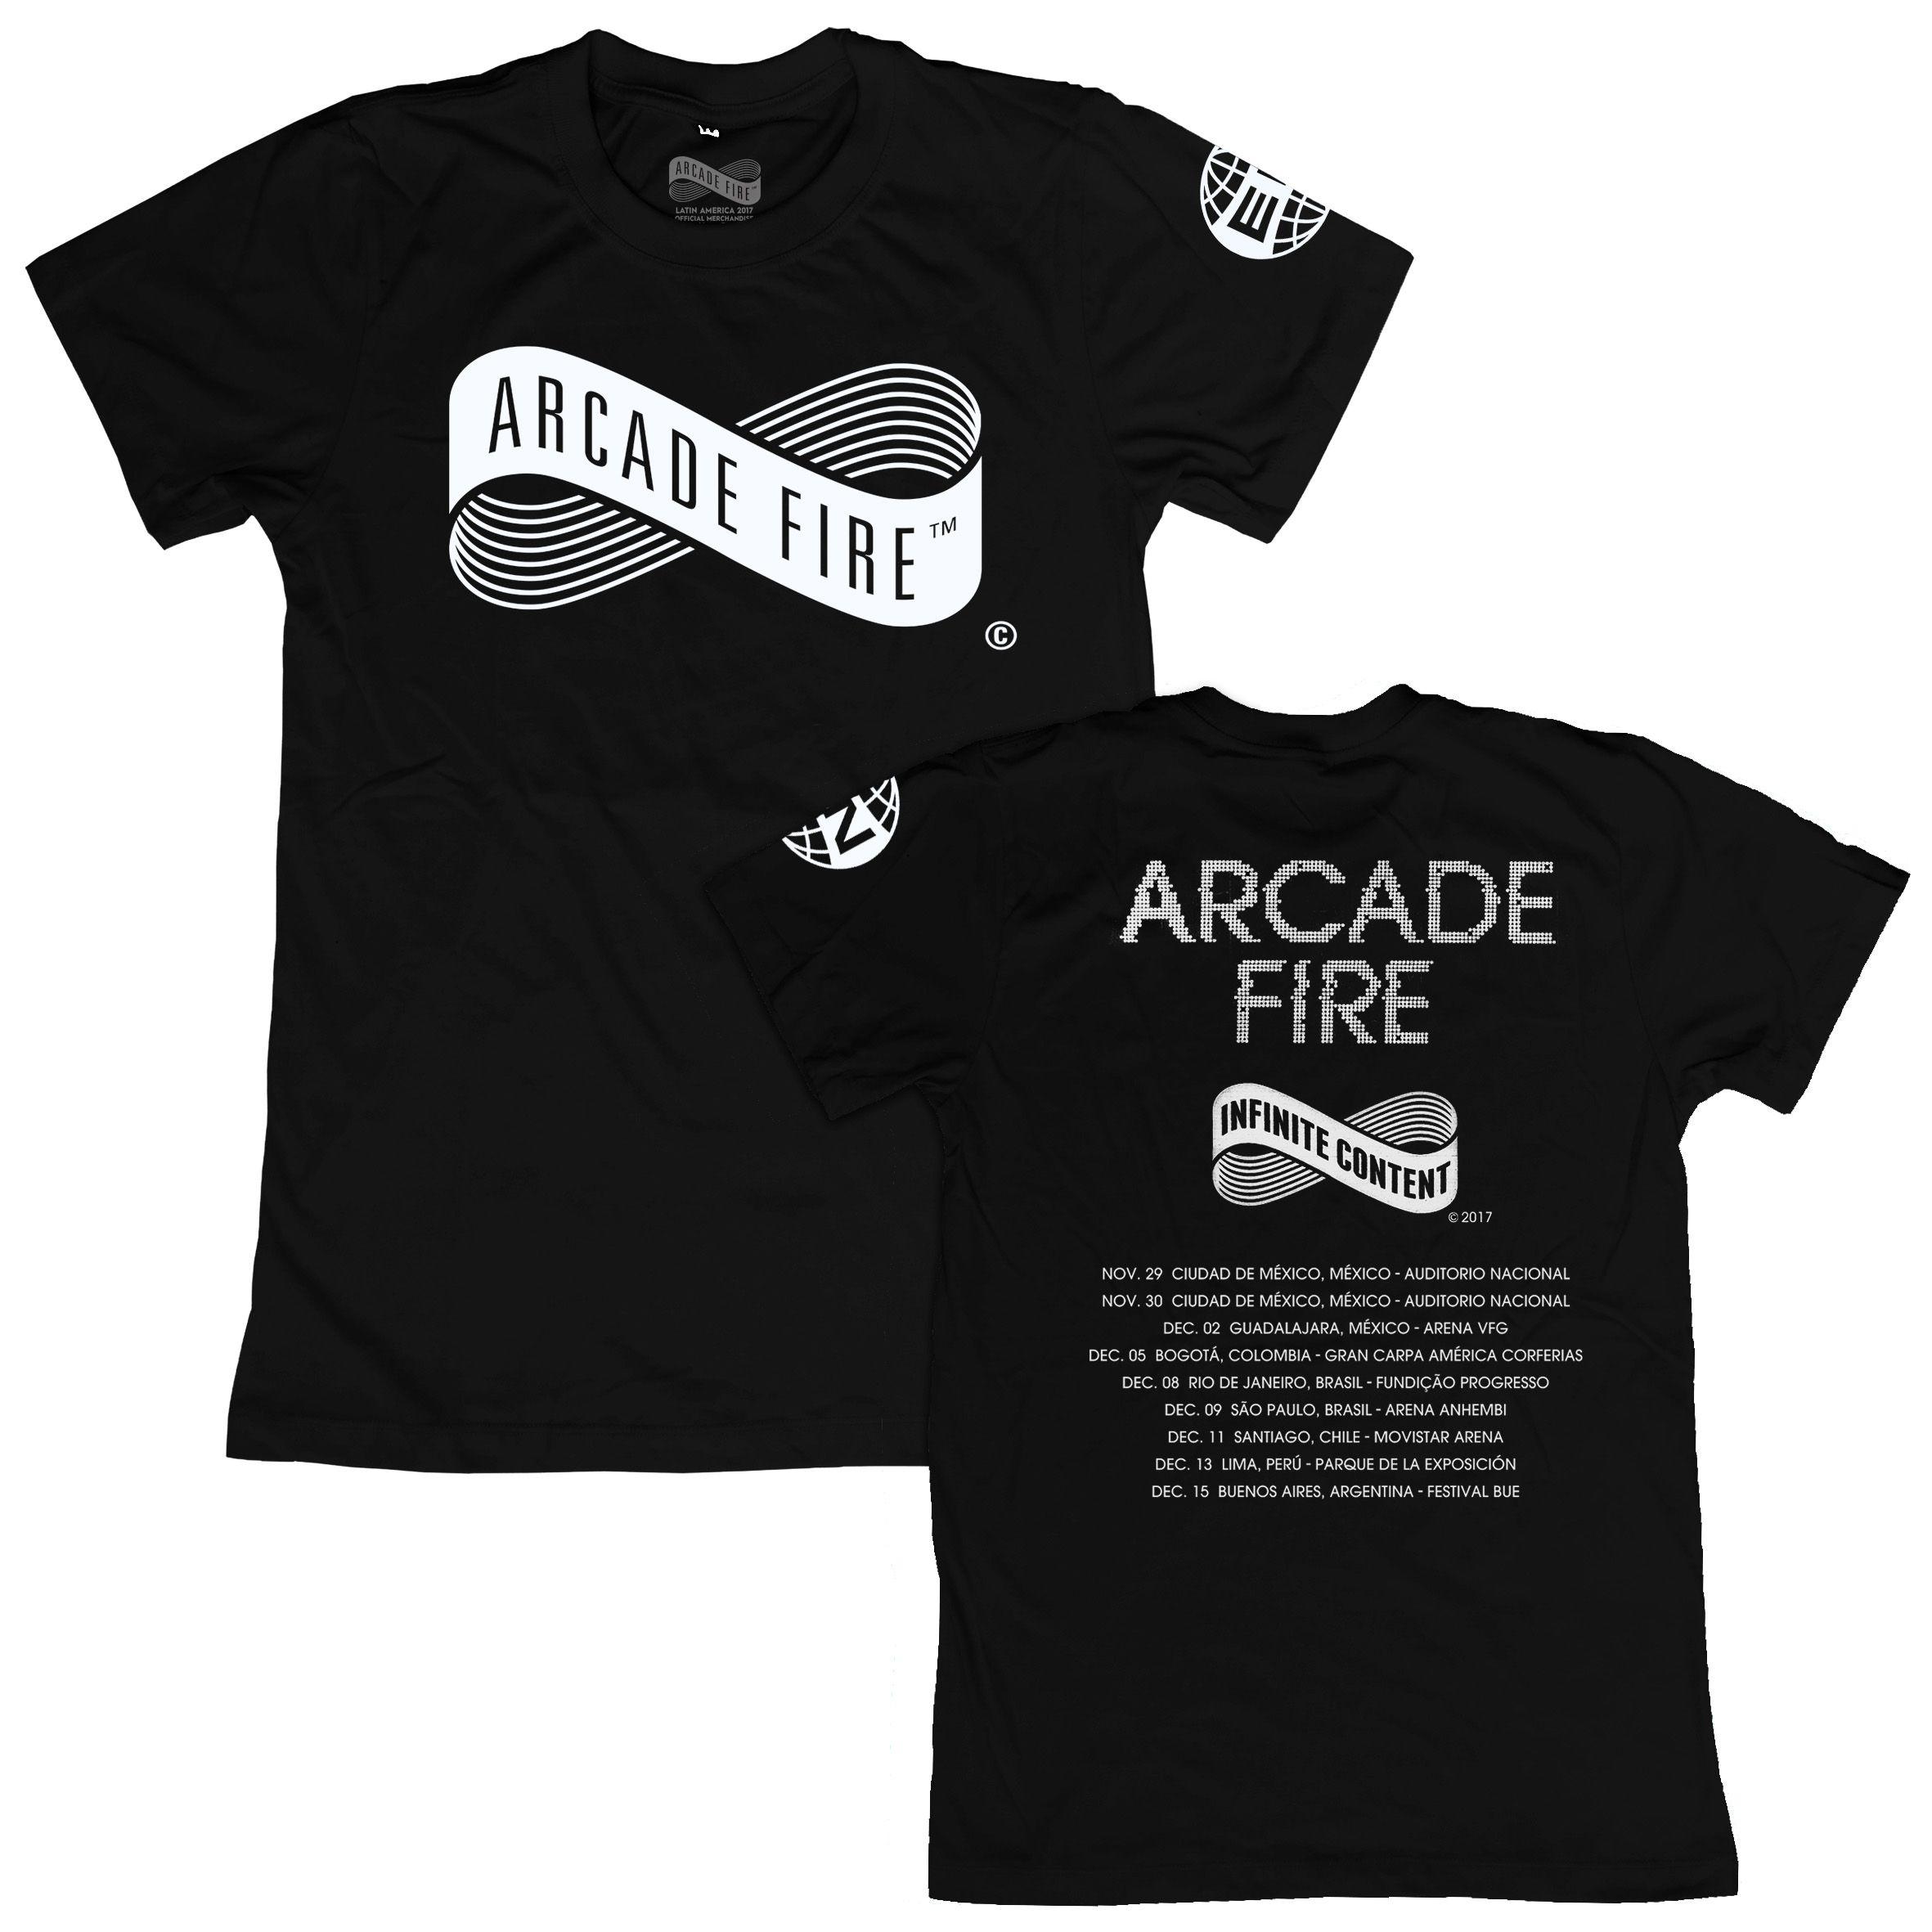 Arcade Fire - Infinity Tour